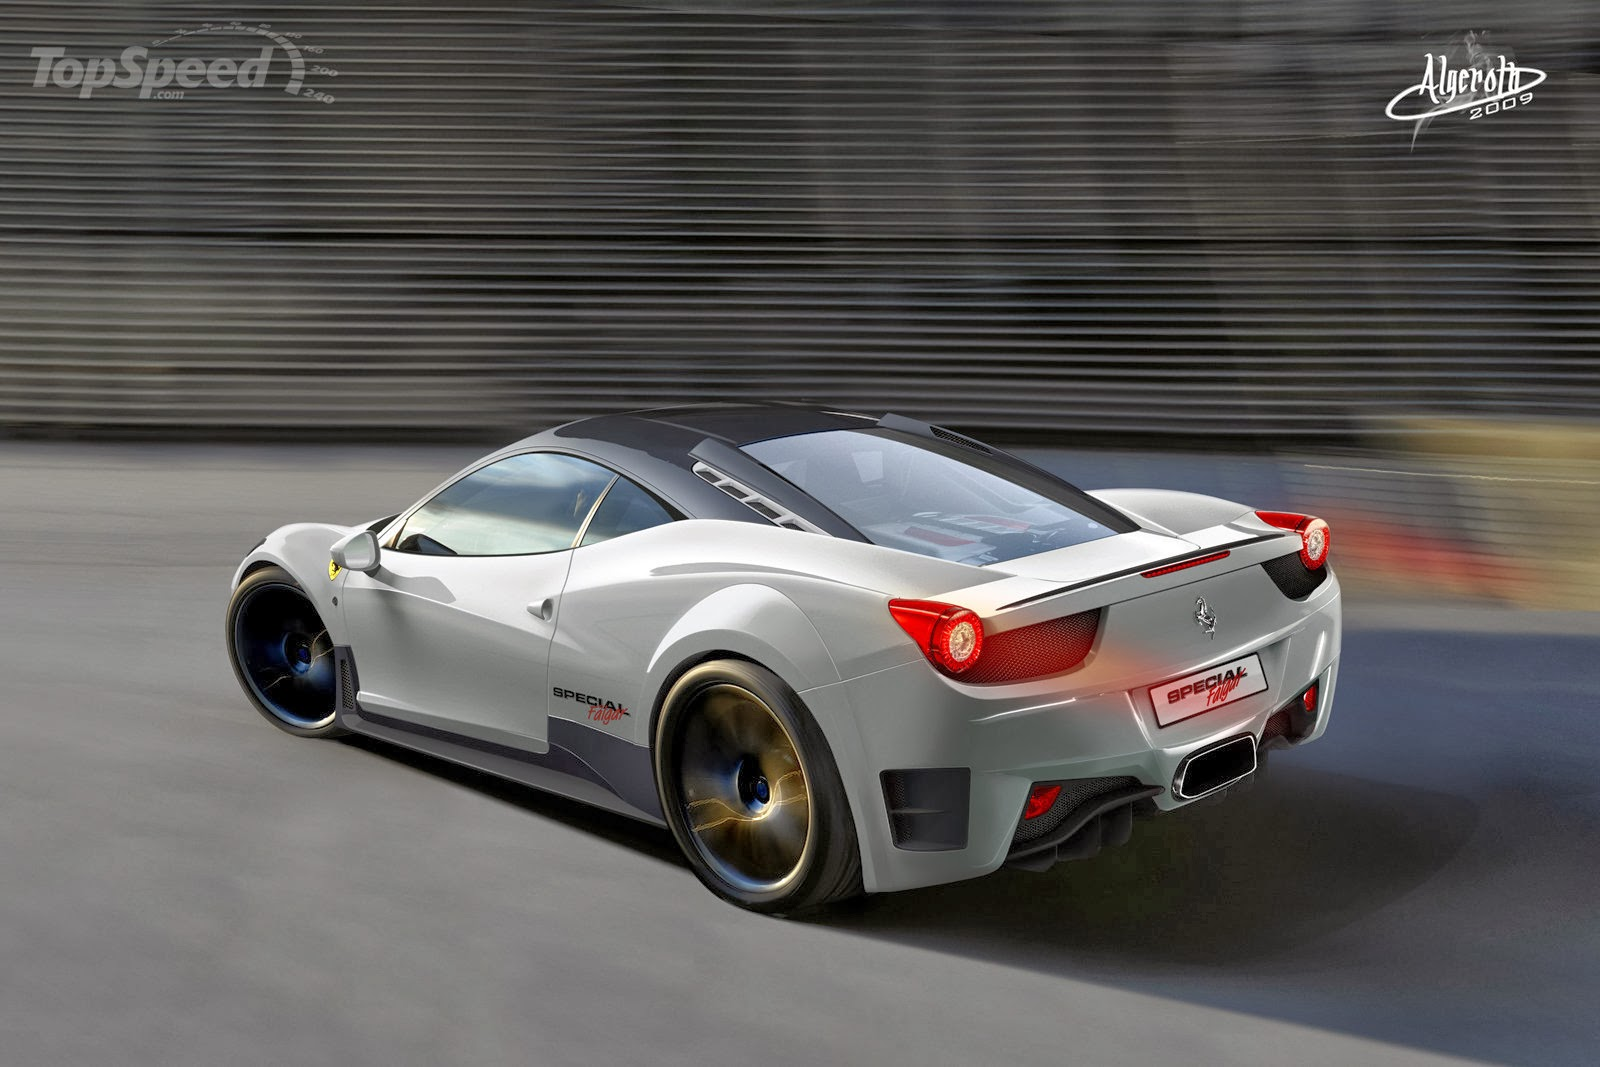 HD Wallpapers Ferrari 458 Italia Wallpapers 1600x1067